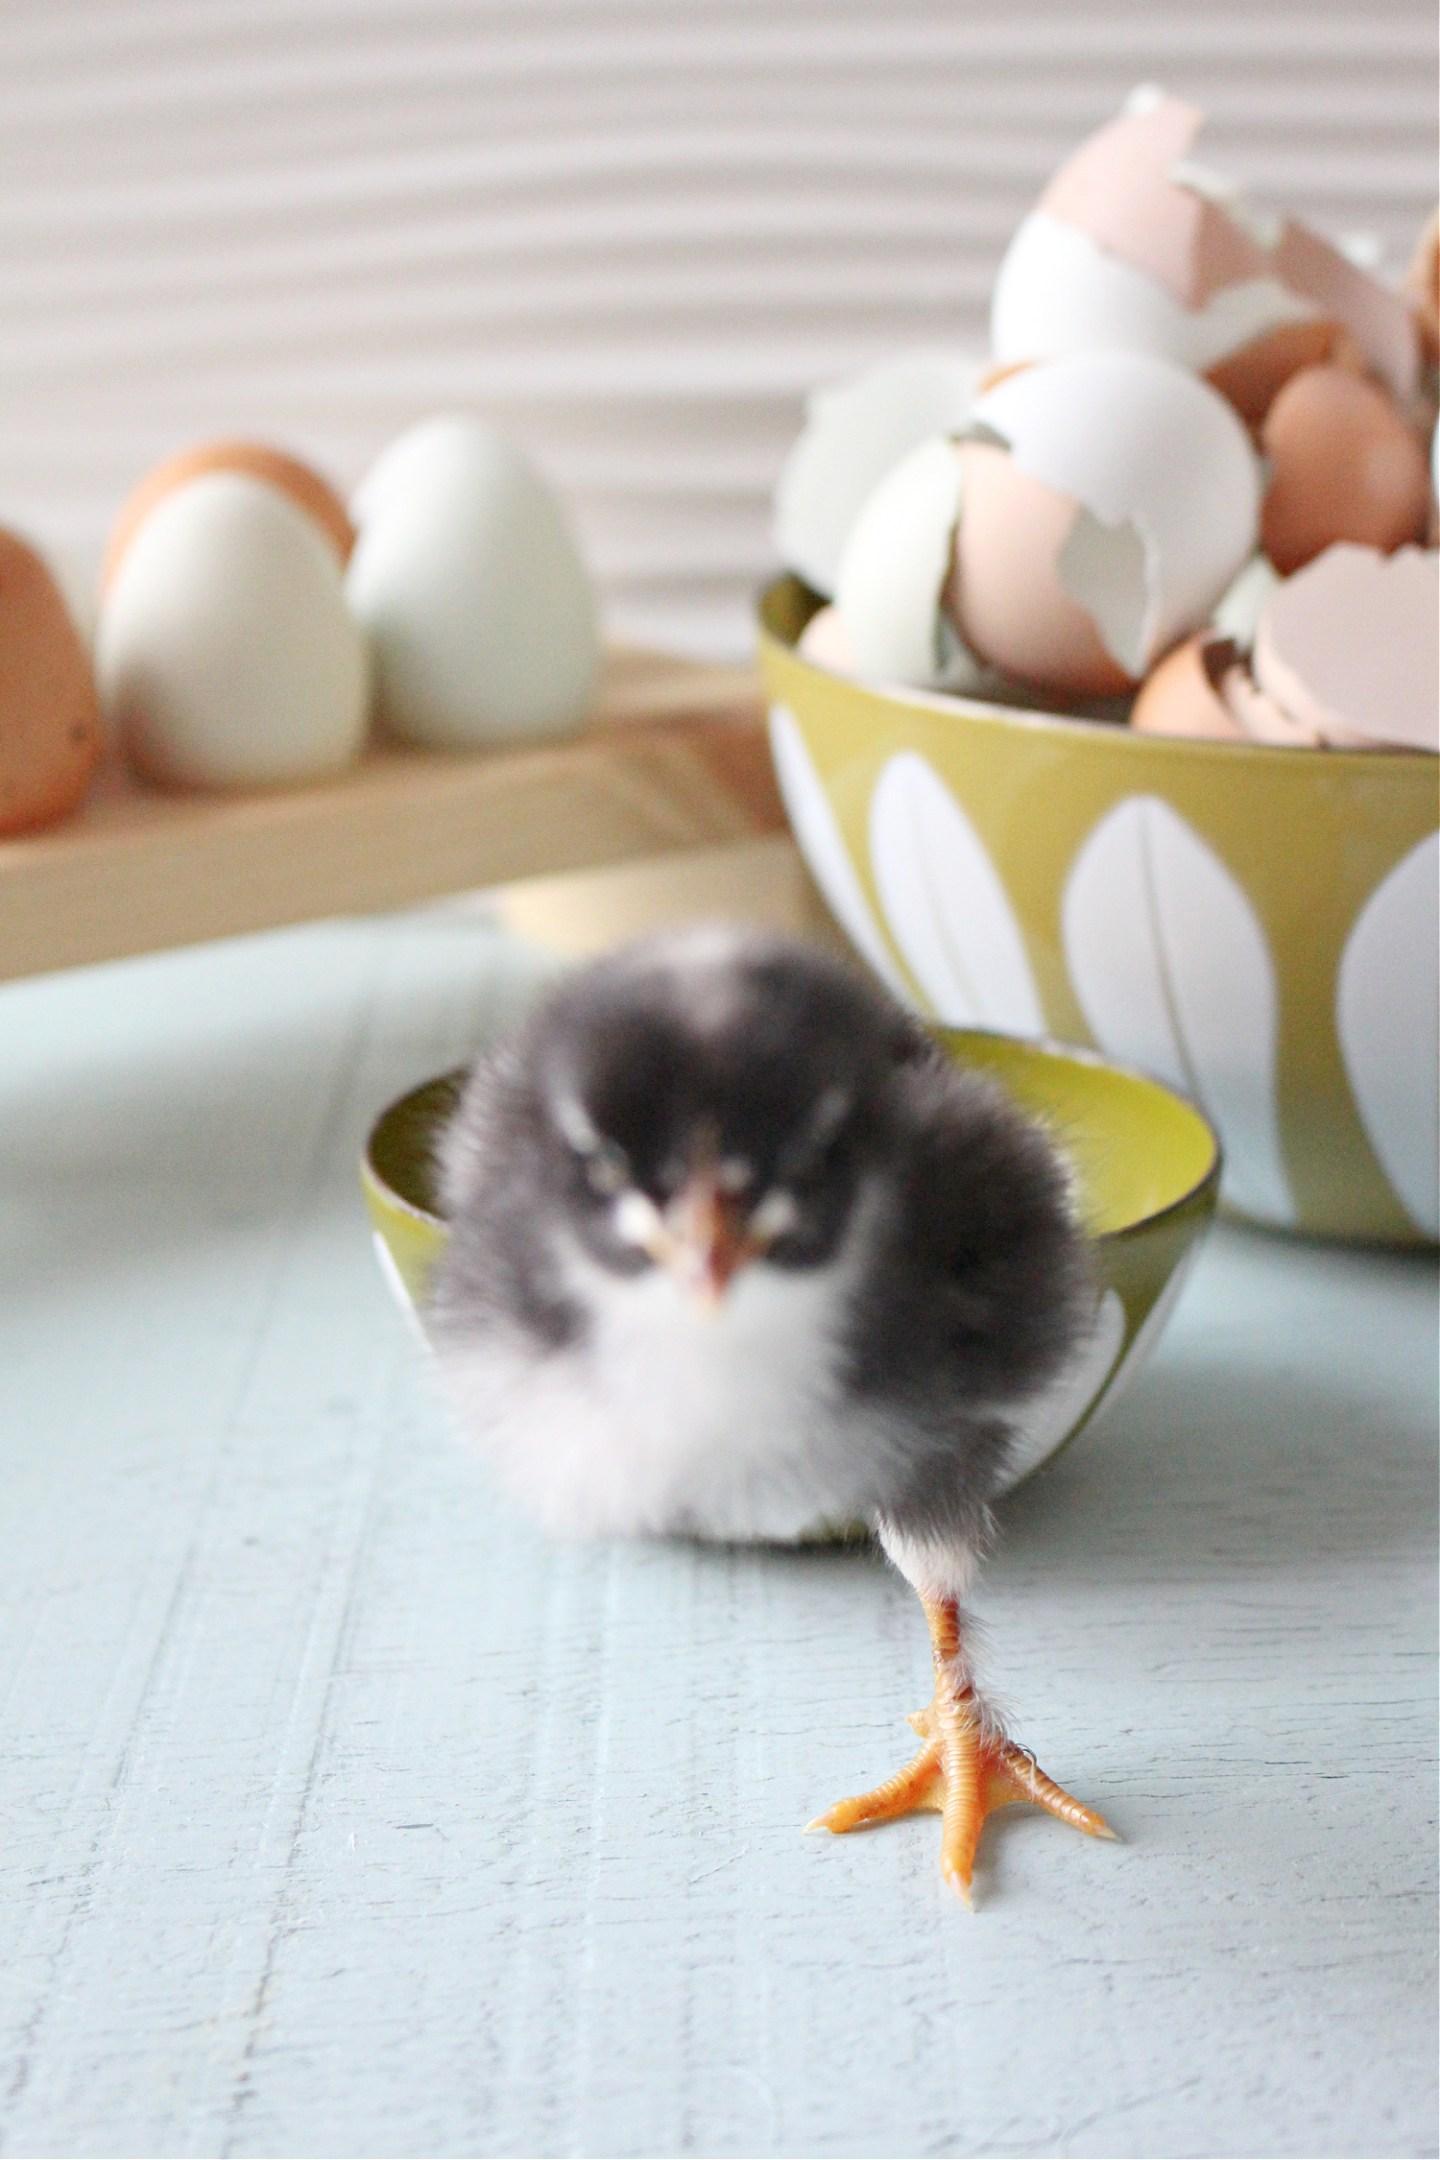 Baby Chick Photos Vol. 3